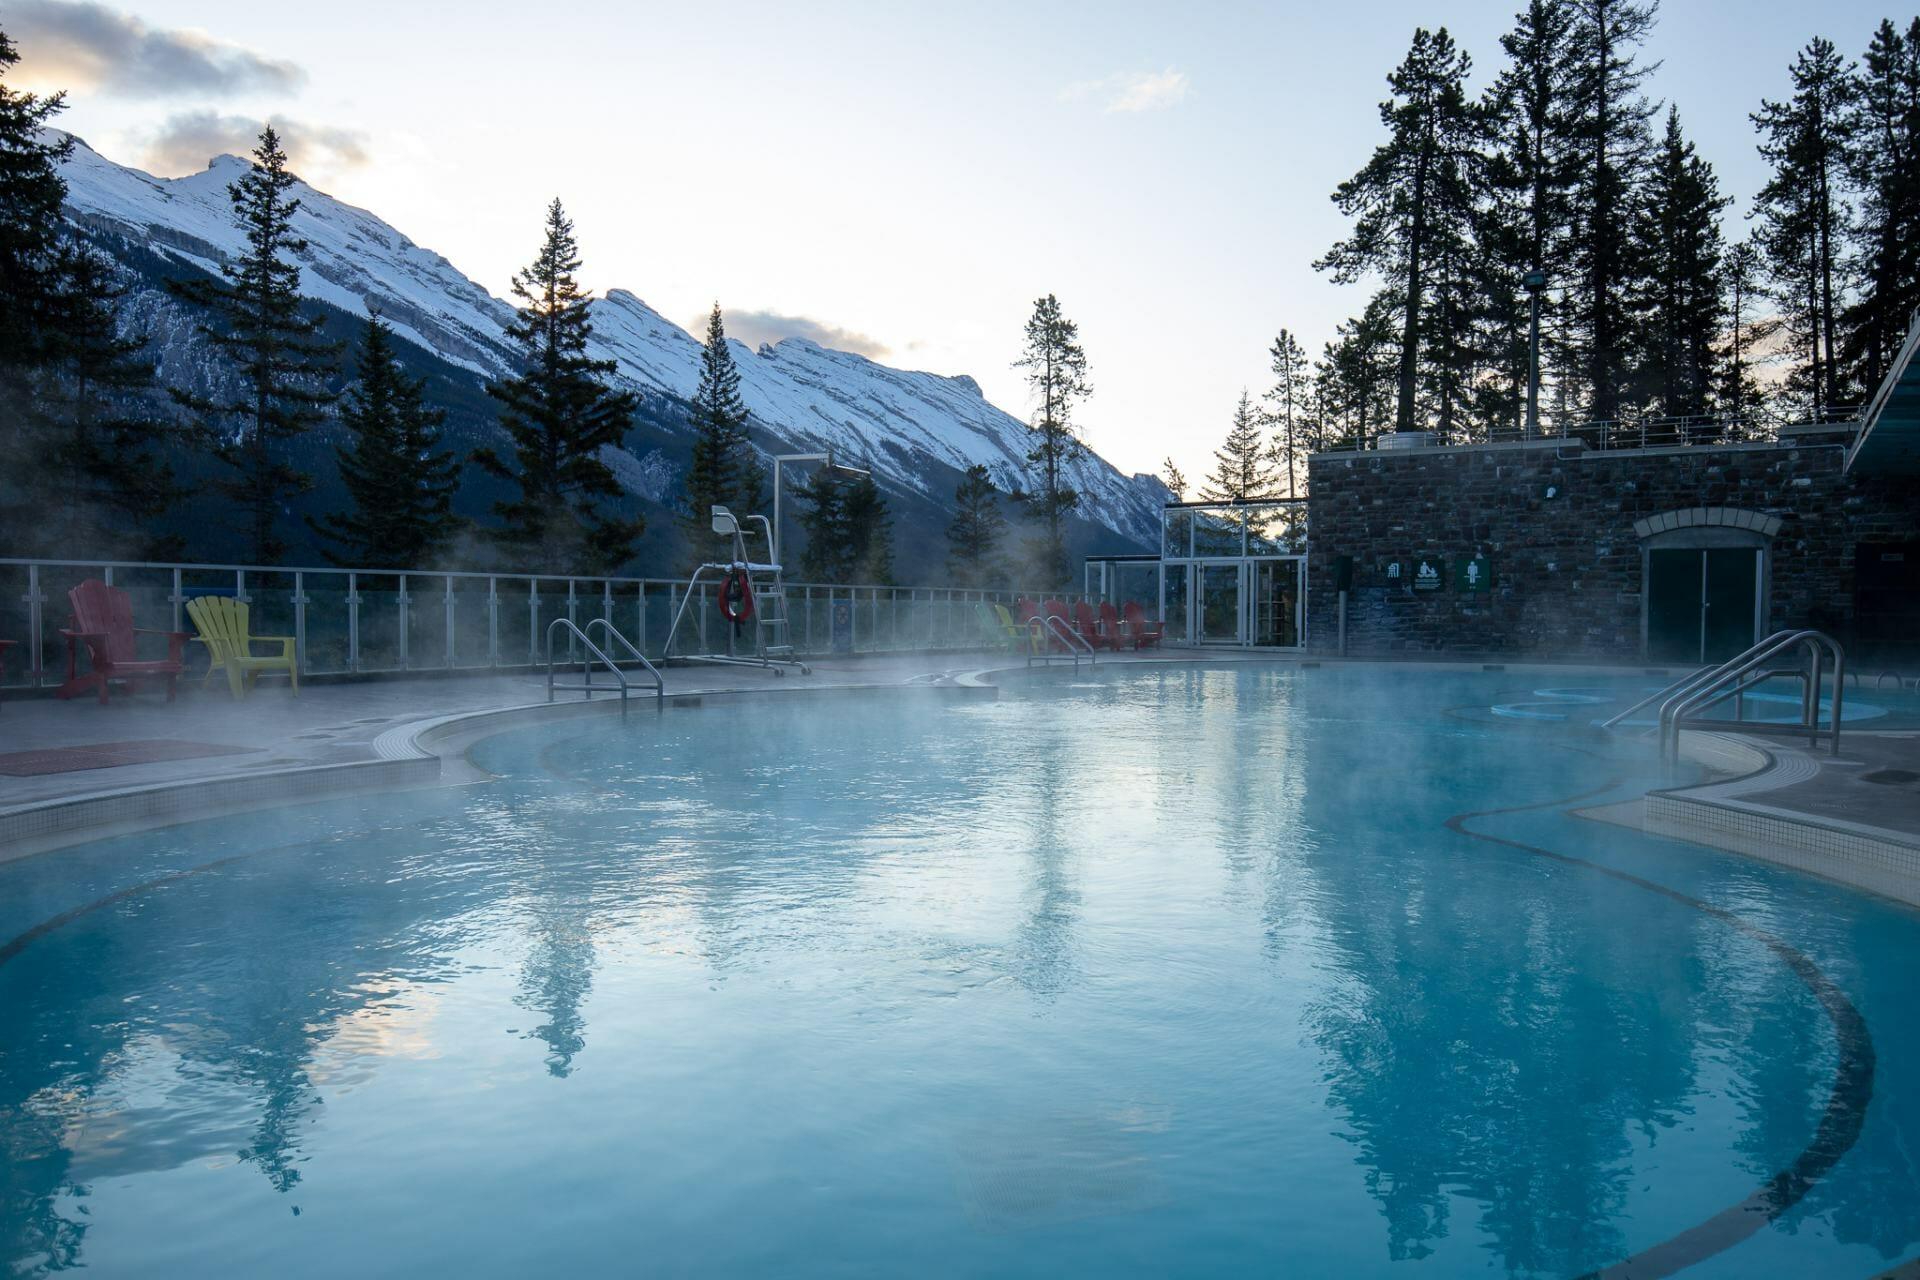 Banff Hot Springs - Best photo spots in Banff